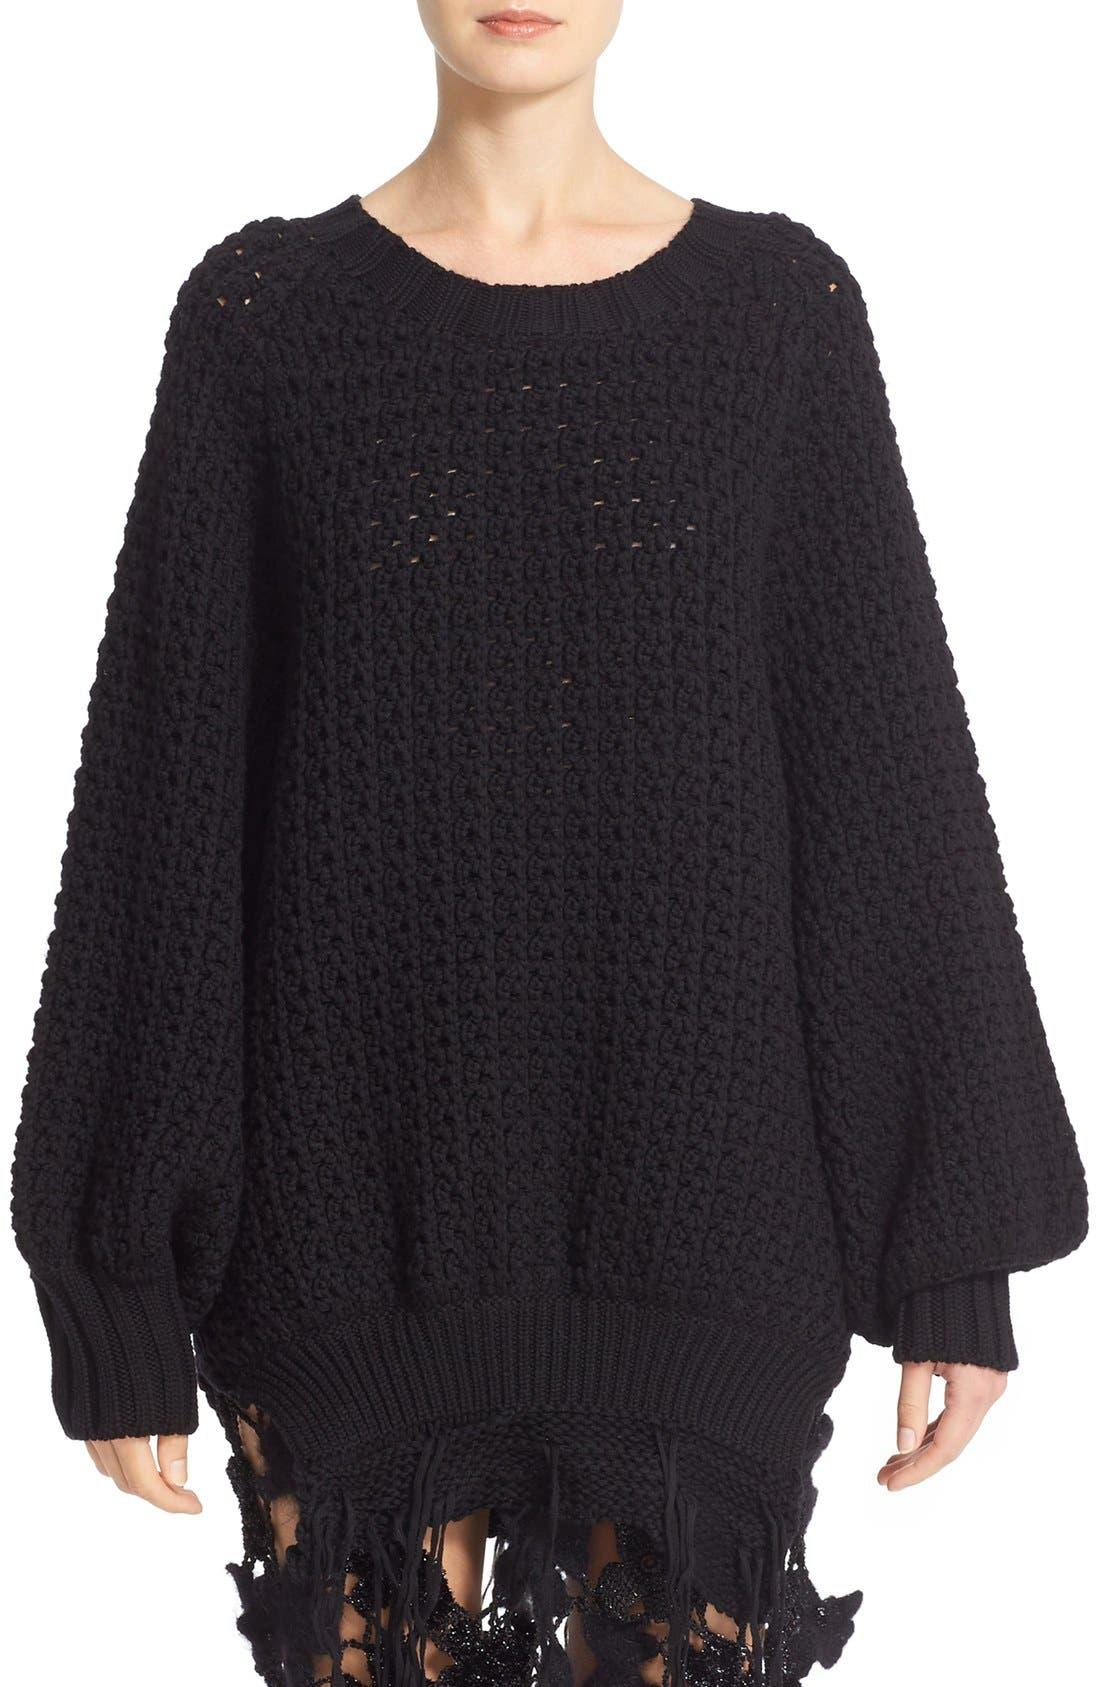 Main Image - Simone Rocha Long Chunky Knit Wool Sweater with Fringe